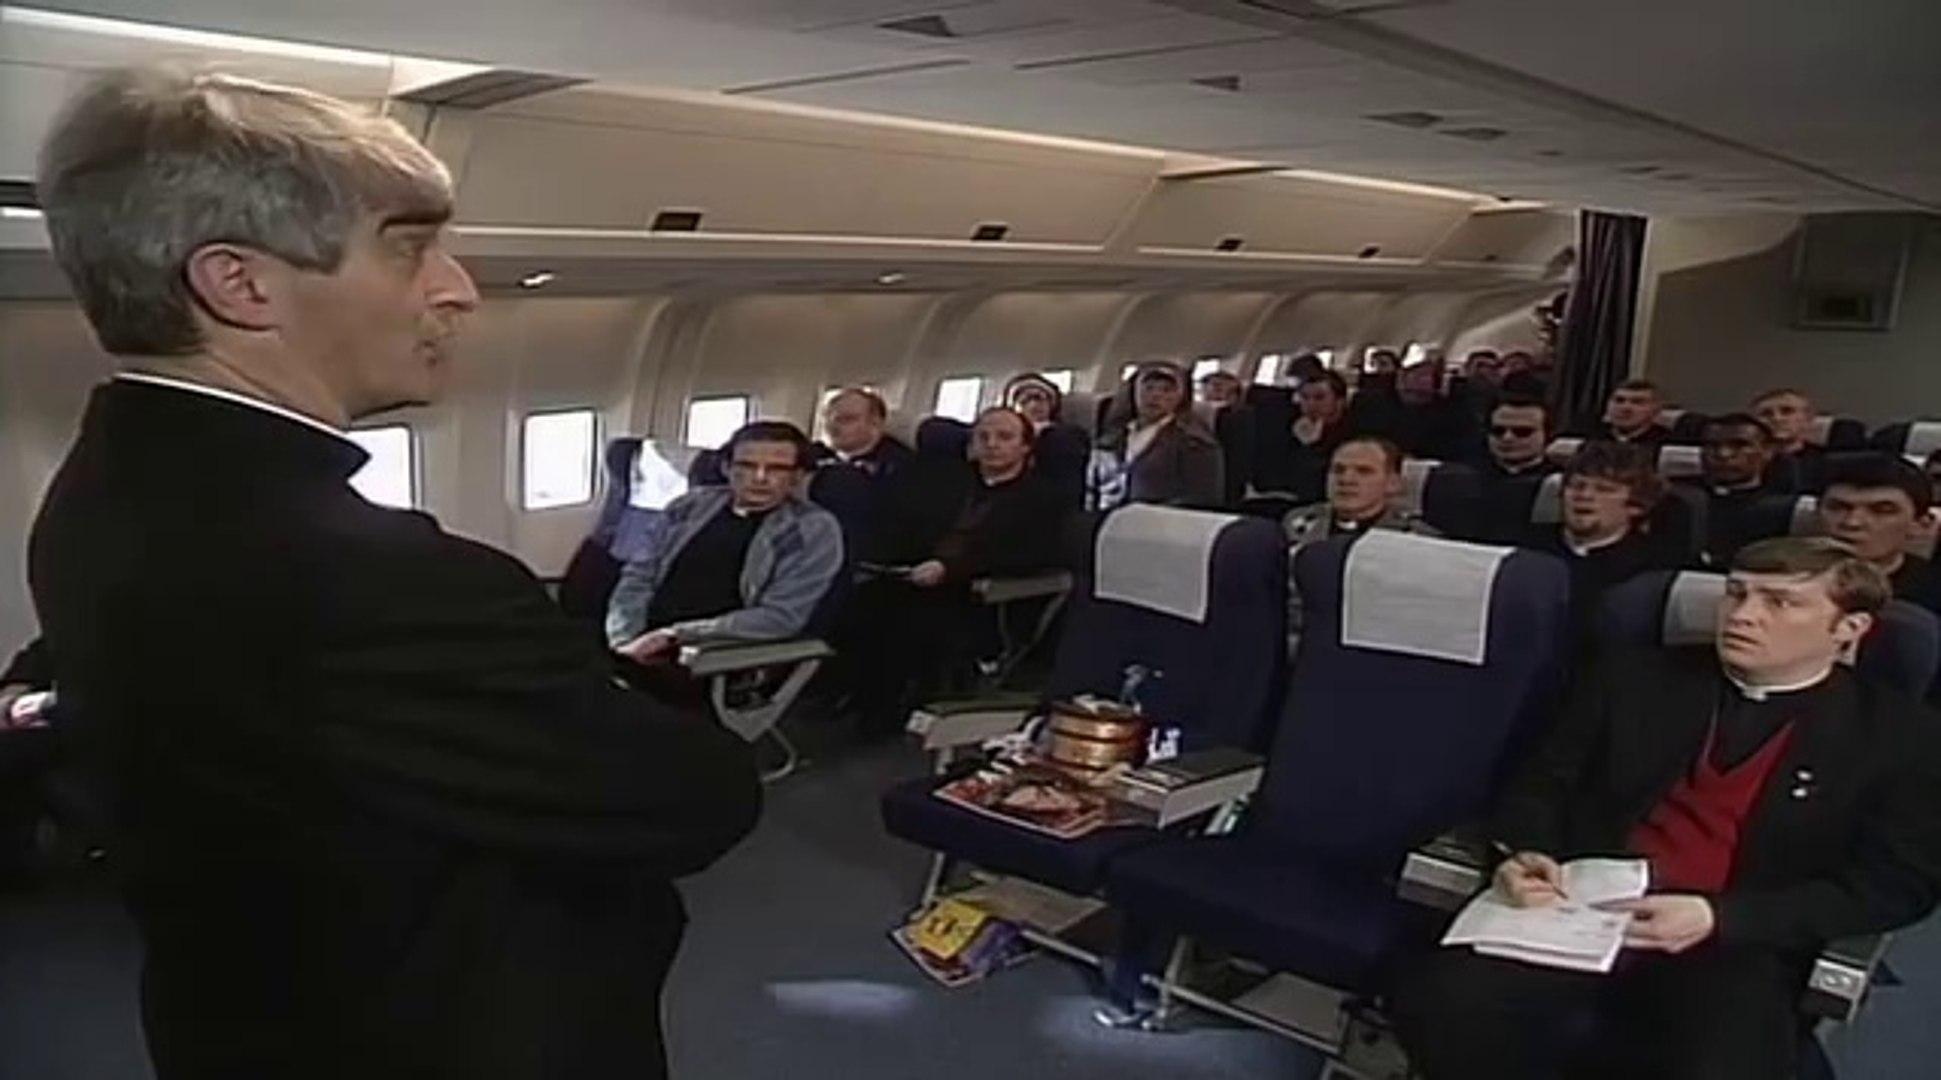 Father Ted S02E10 Flight into Terror